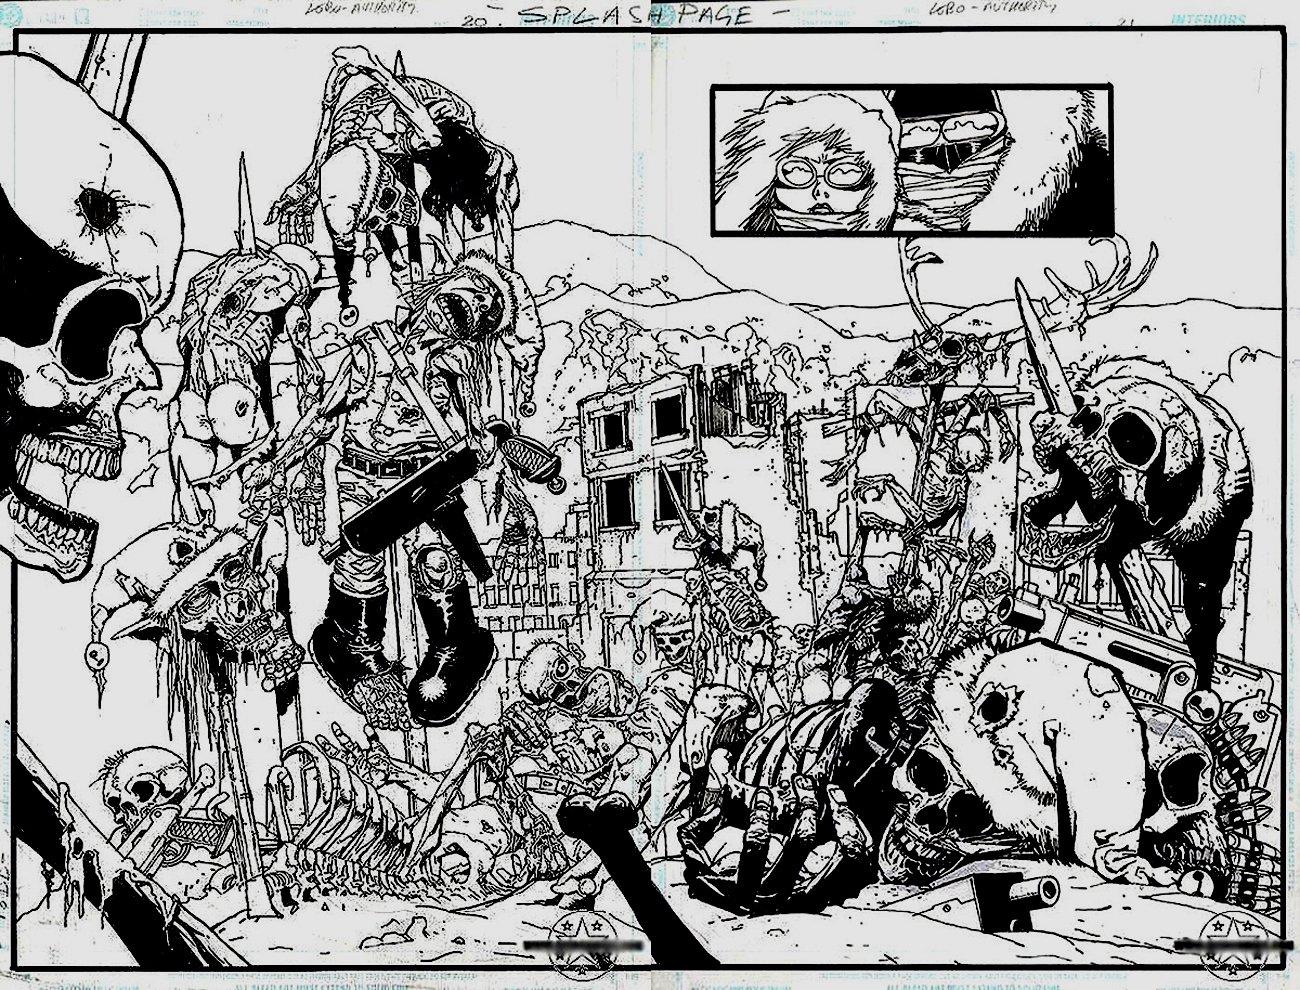 Authority / Lobo: Jingle Hell #1 p 20-21 Double Spread Splash (2003)